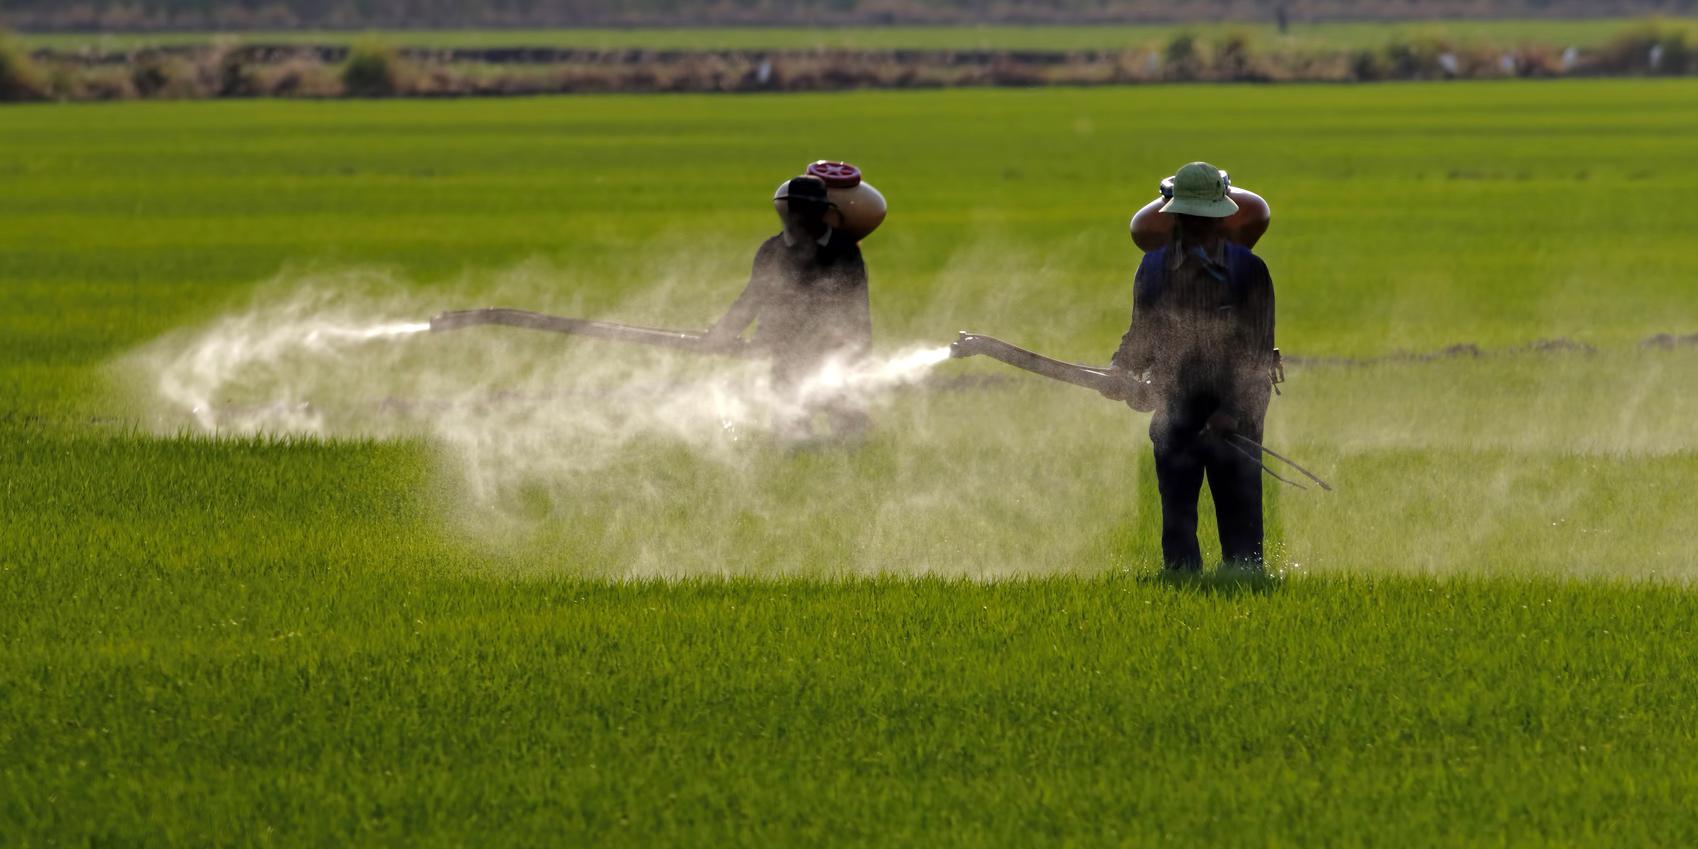 Tell the EPA to Regulate Glyphosate!